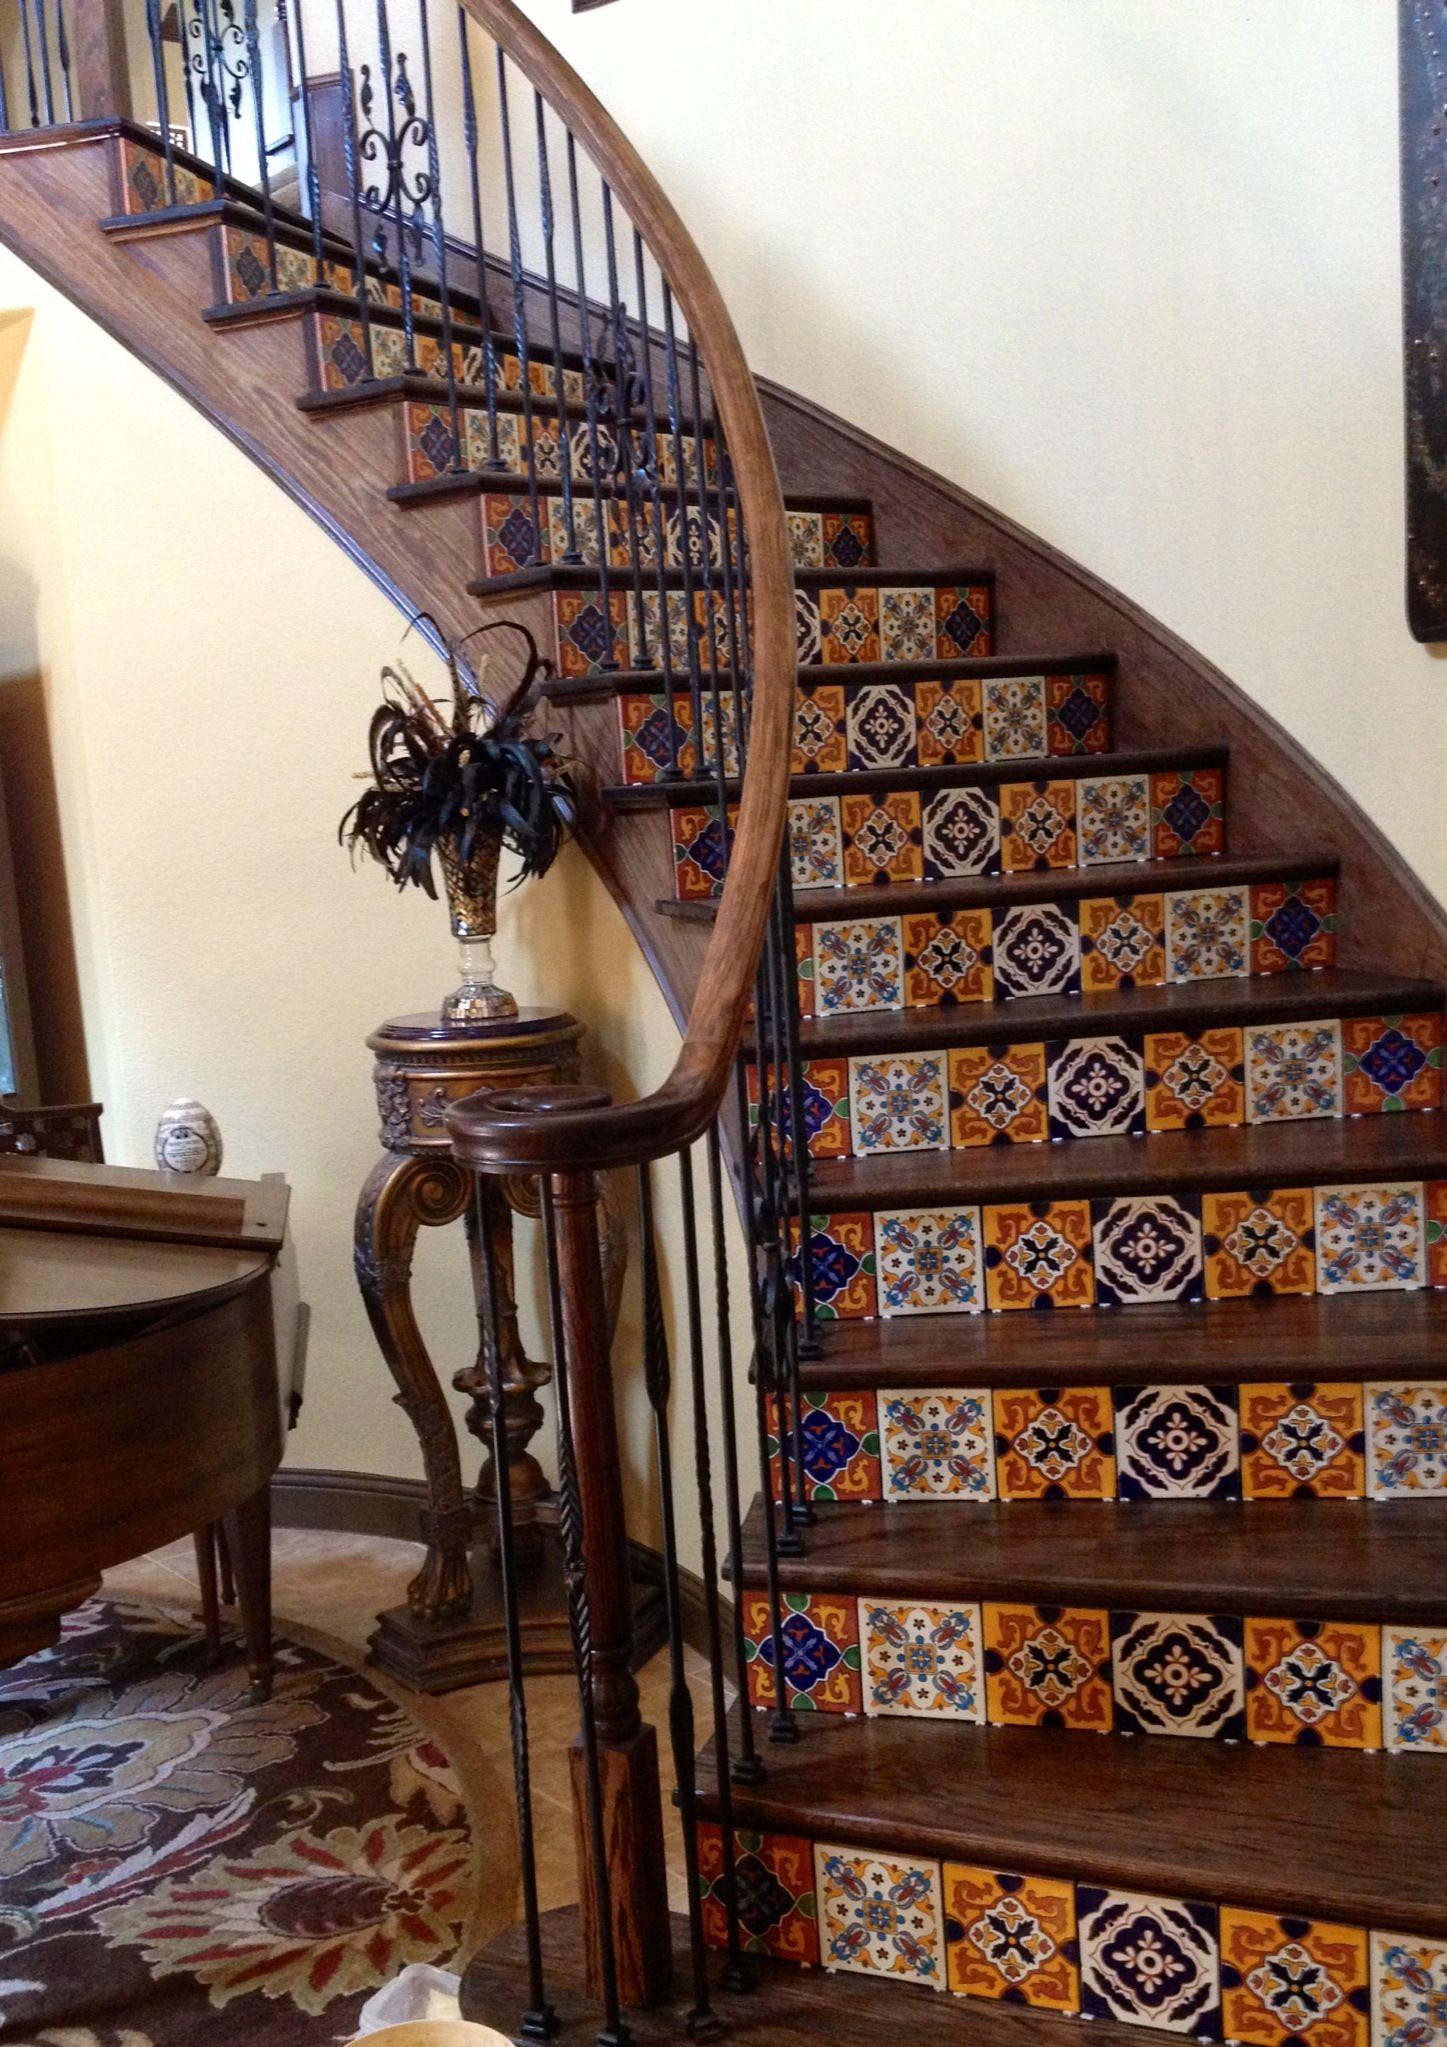 Best Mexican Tile On Stairs Escaleras Rústicas Fachada De 400 x 300